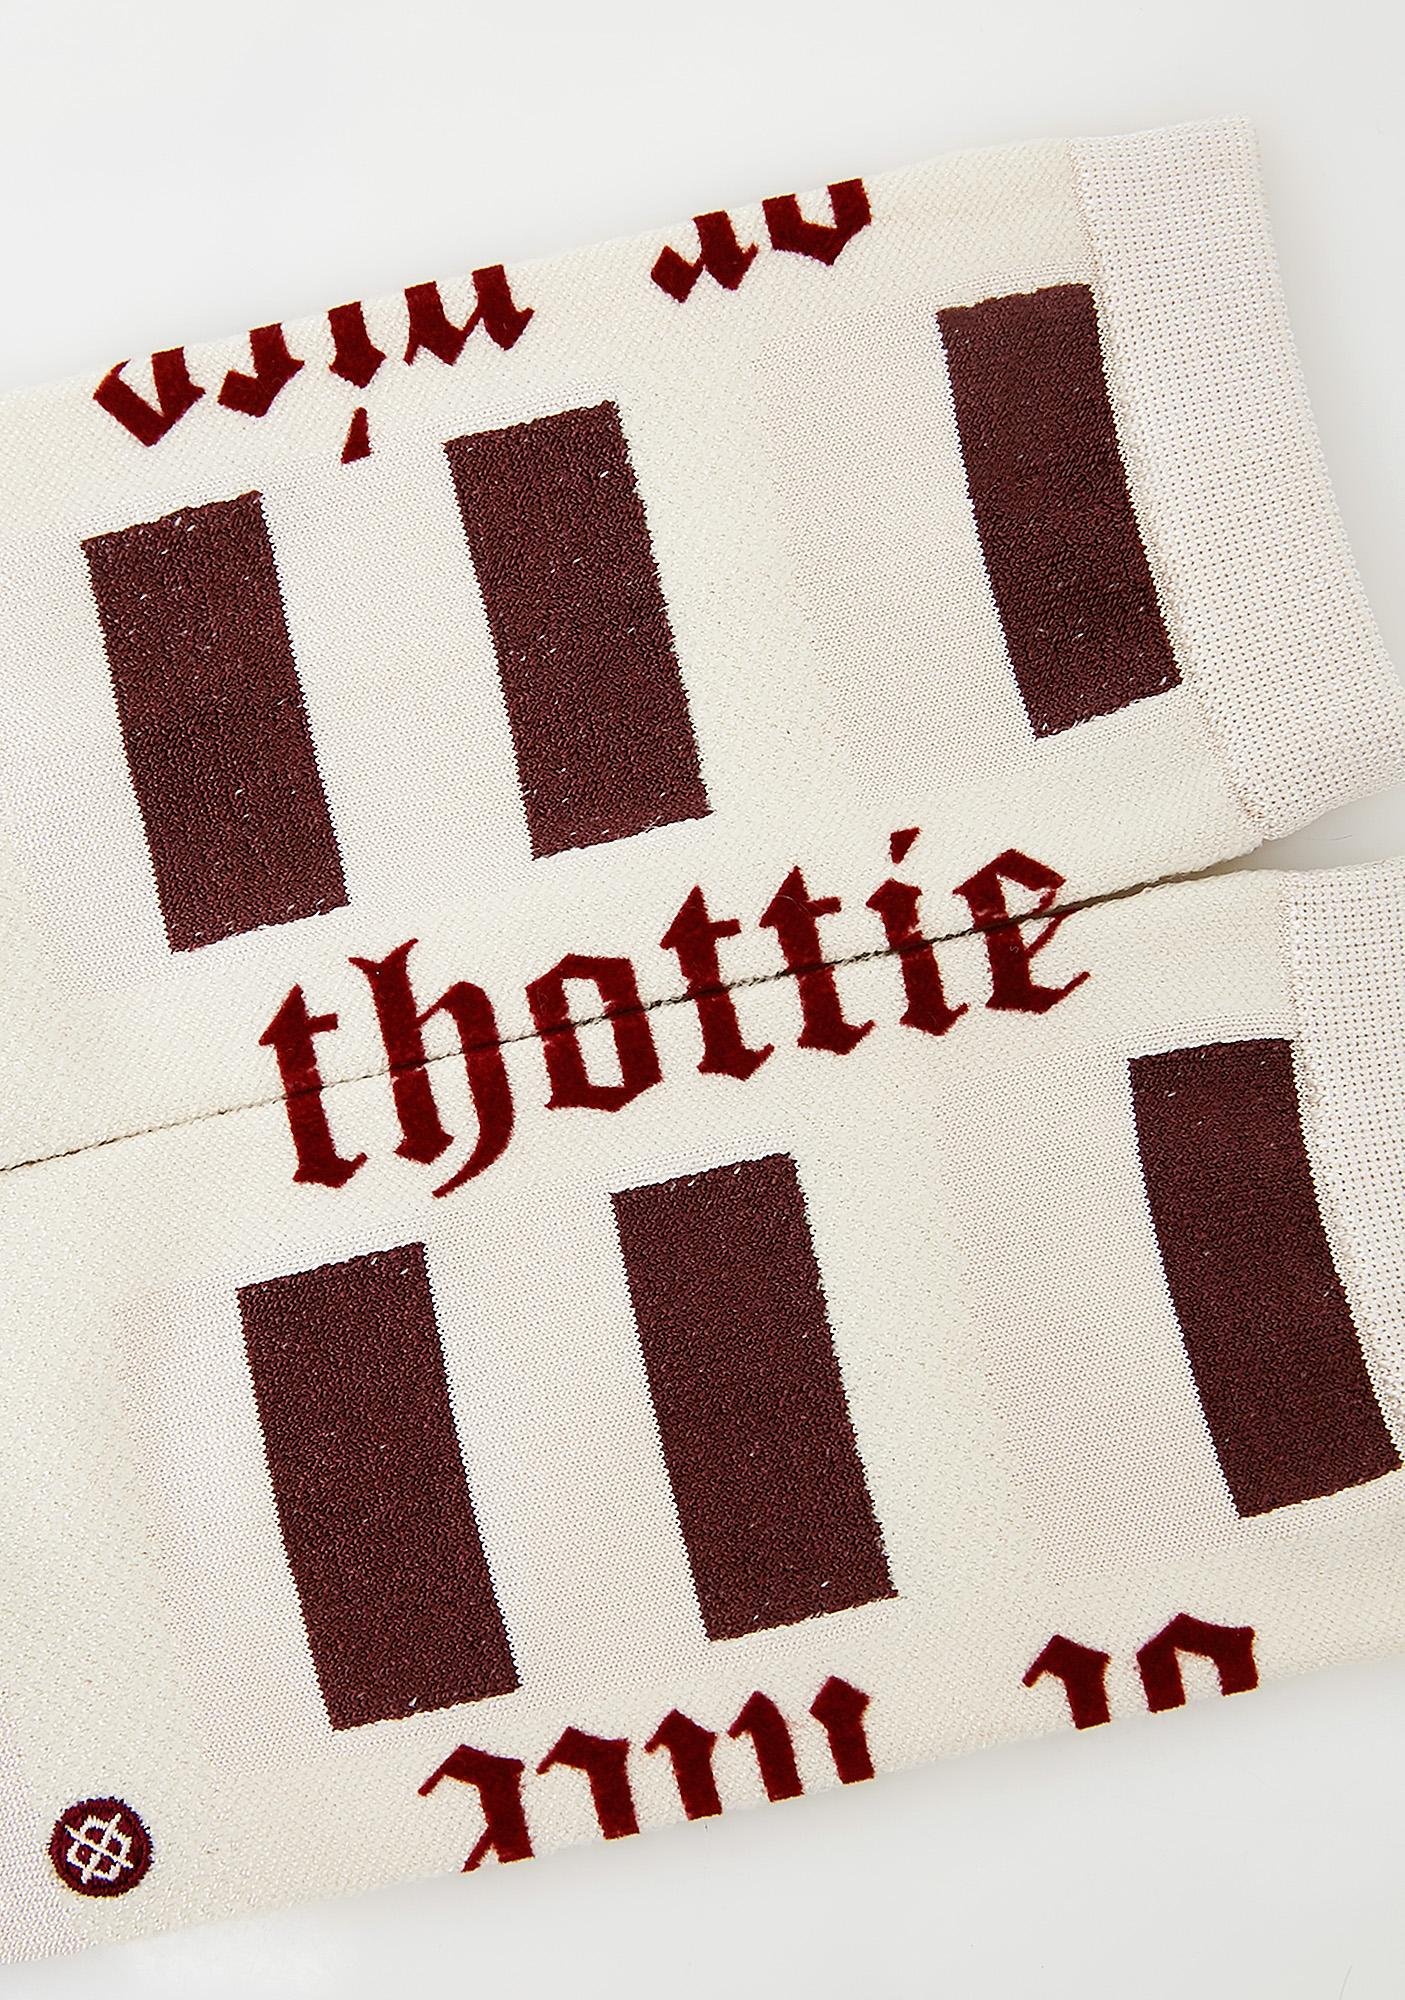 Stance The Thottie Socks